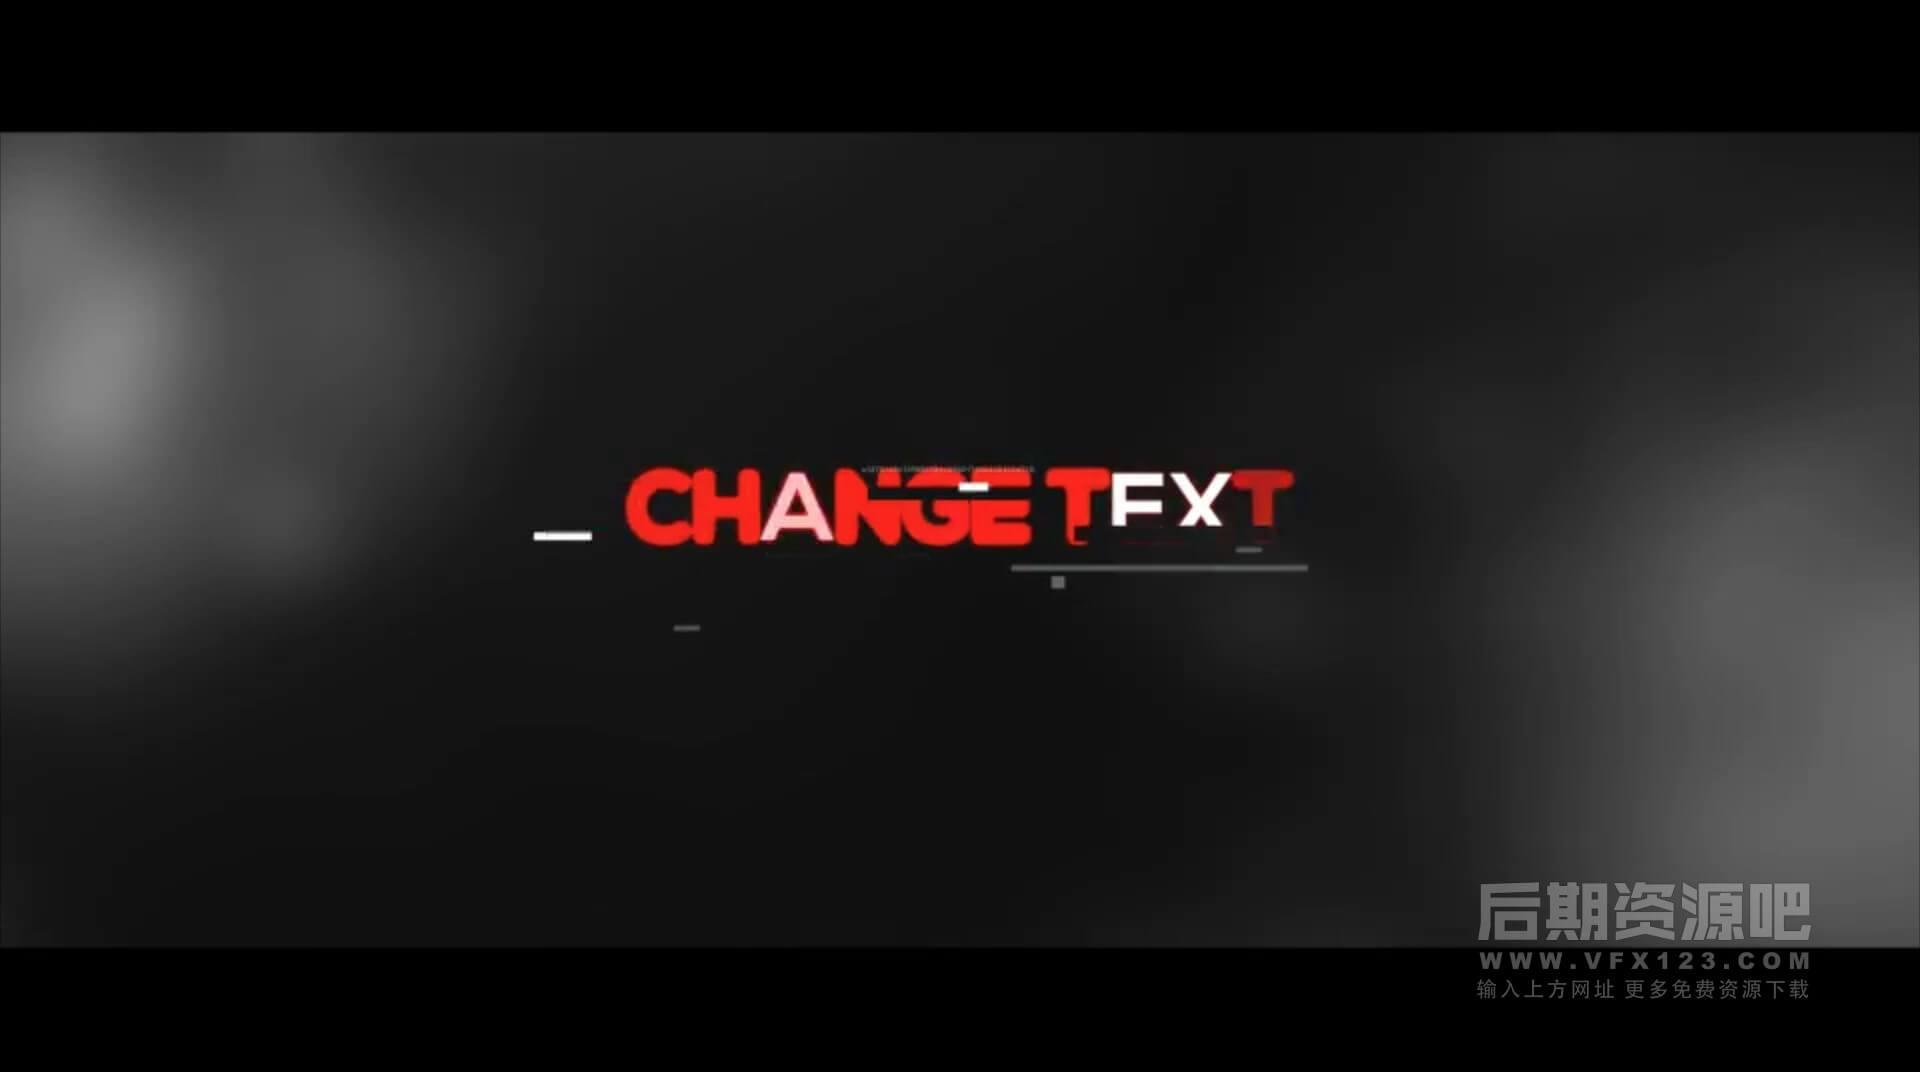 Fcpx标题插件 20组信号故障干扰马赛克效果 Vlog常用标题模板